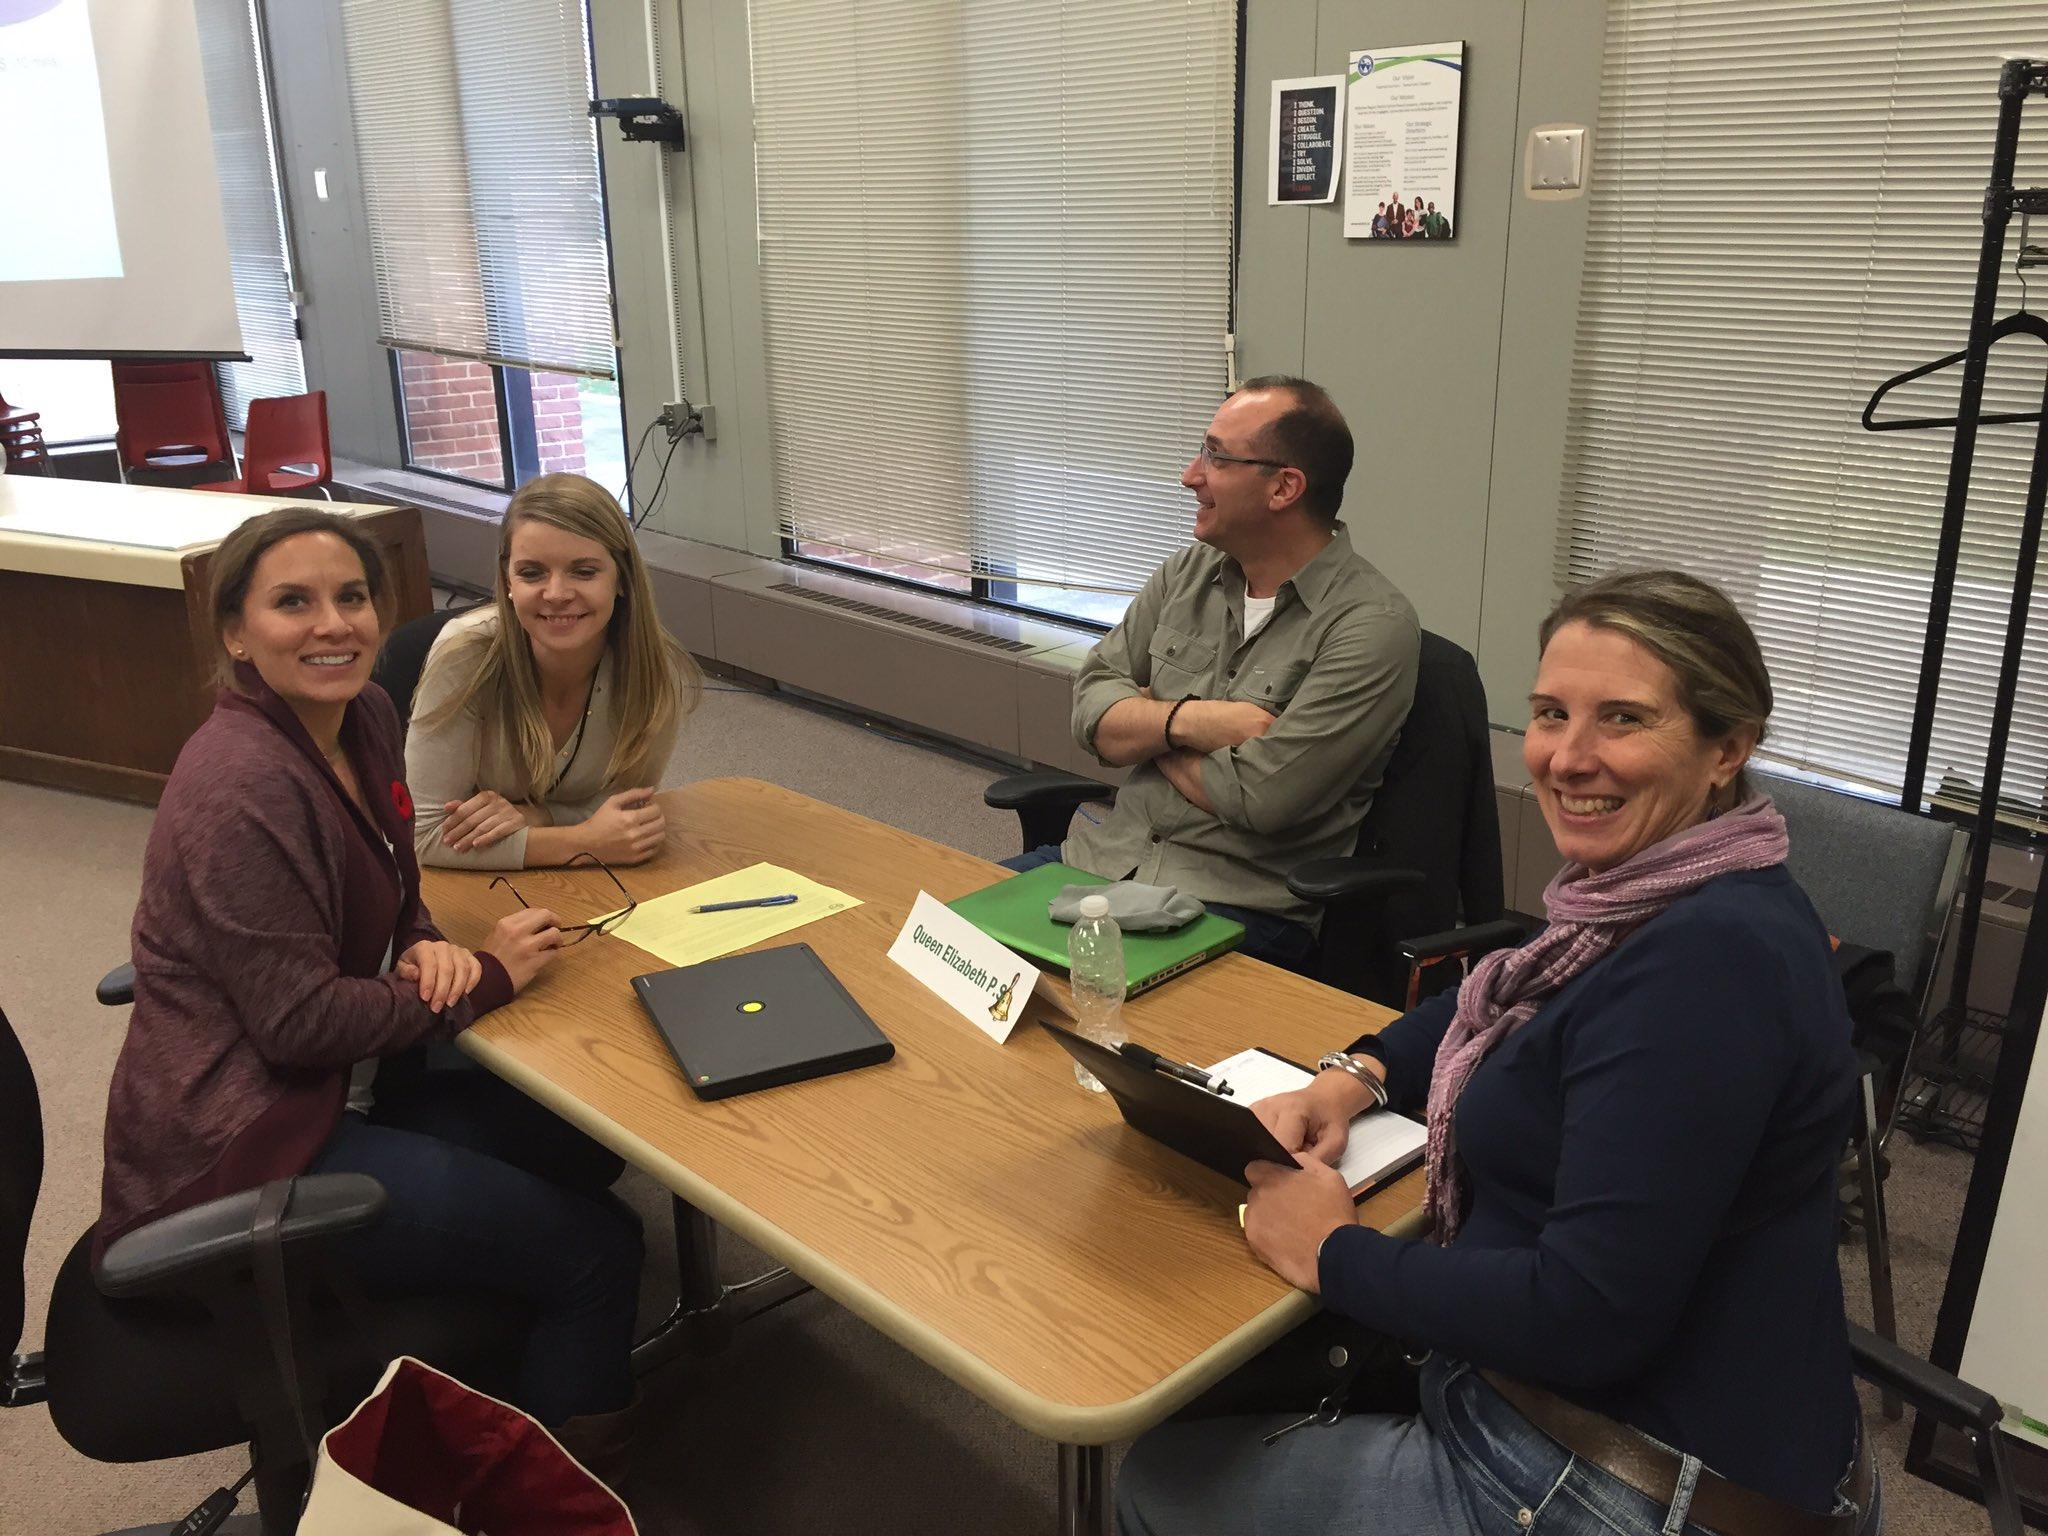 #wrdsblearns QueenElizabeth PS staff getting ready for school planning. https://t.co/Ni9NN0FdjO